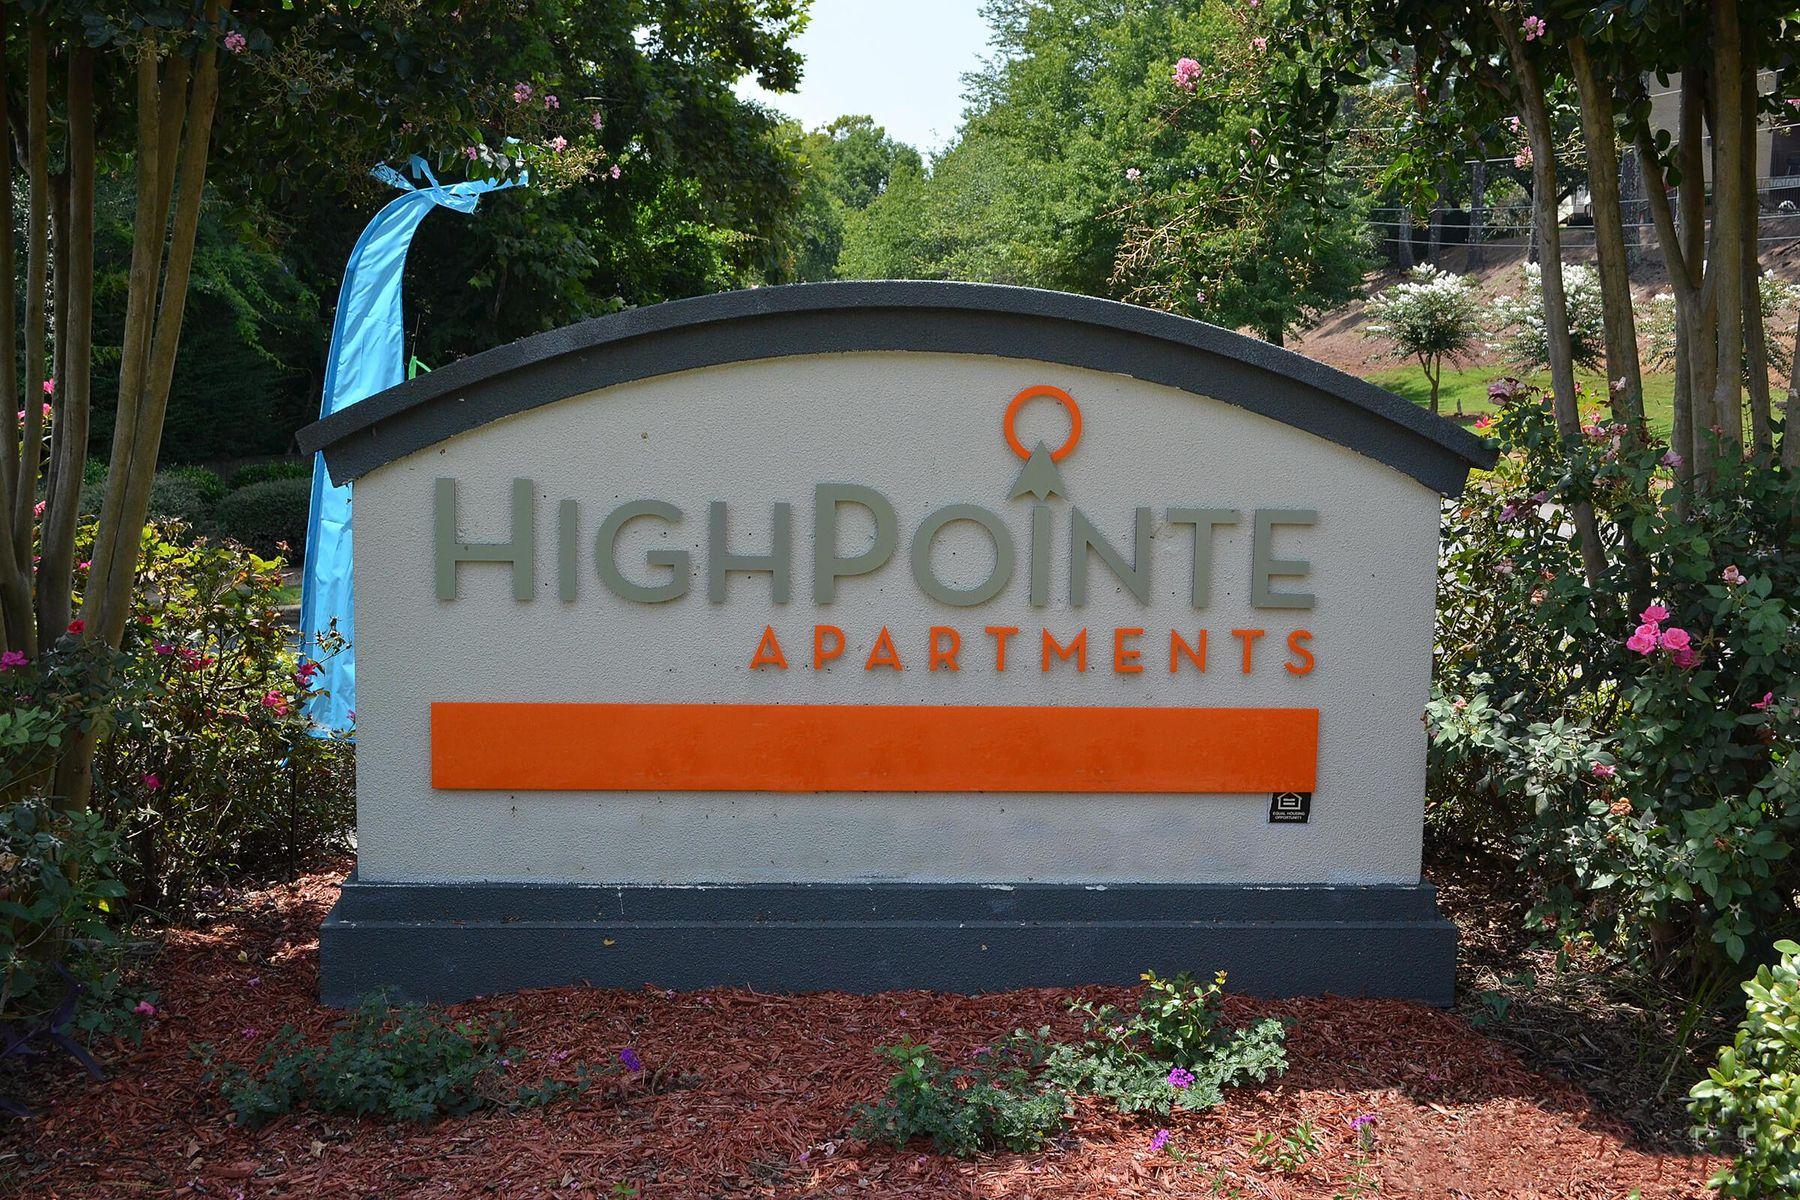 13387_hdp_highpointe_160906_ext_sign1.jpg